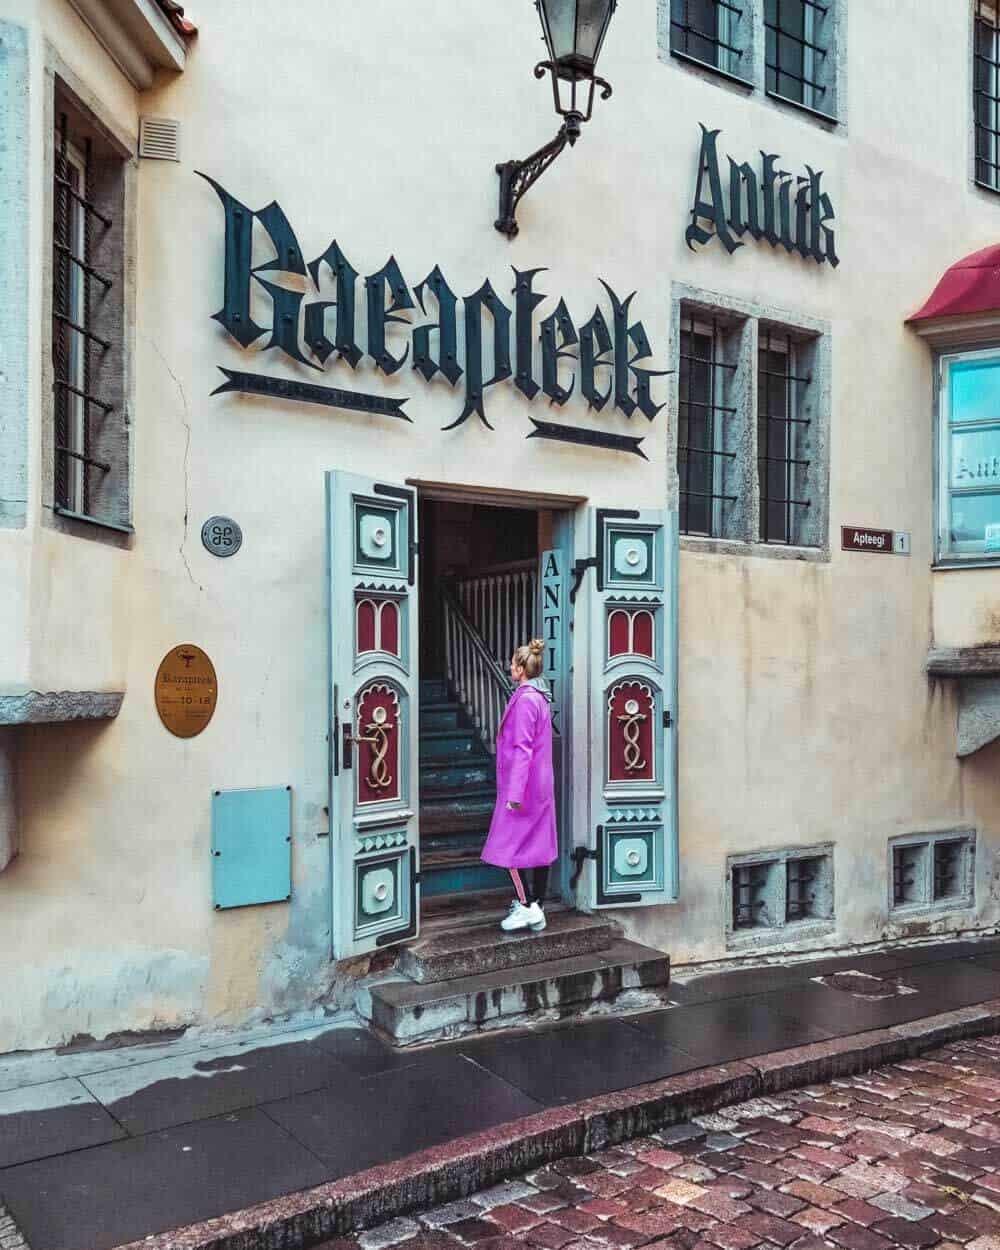 Things to do in Tallinn Estonia!